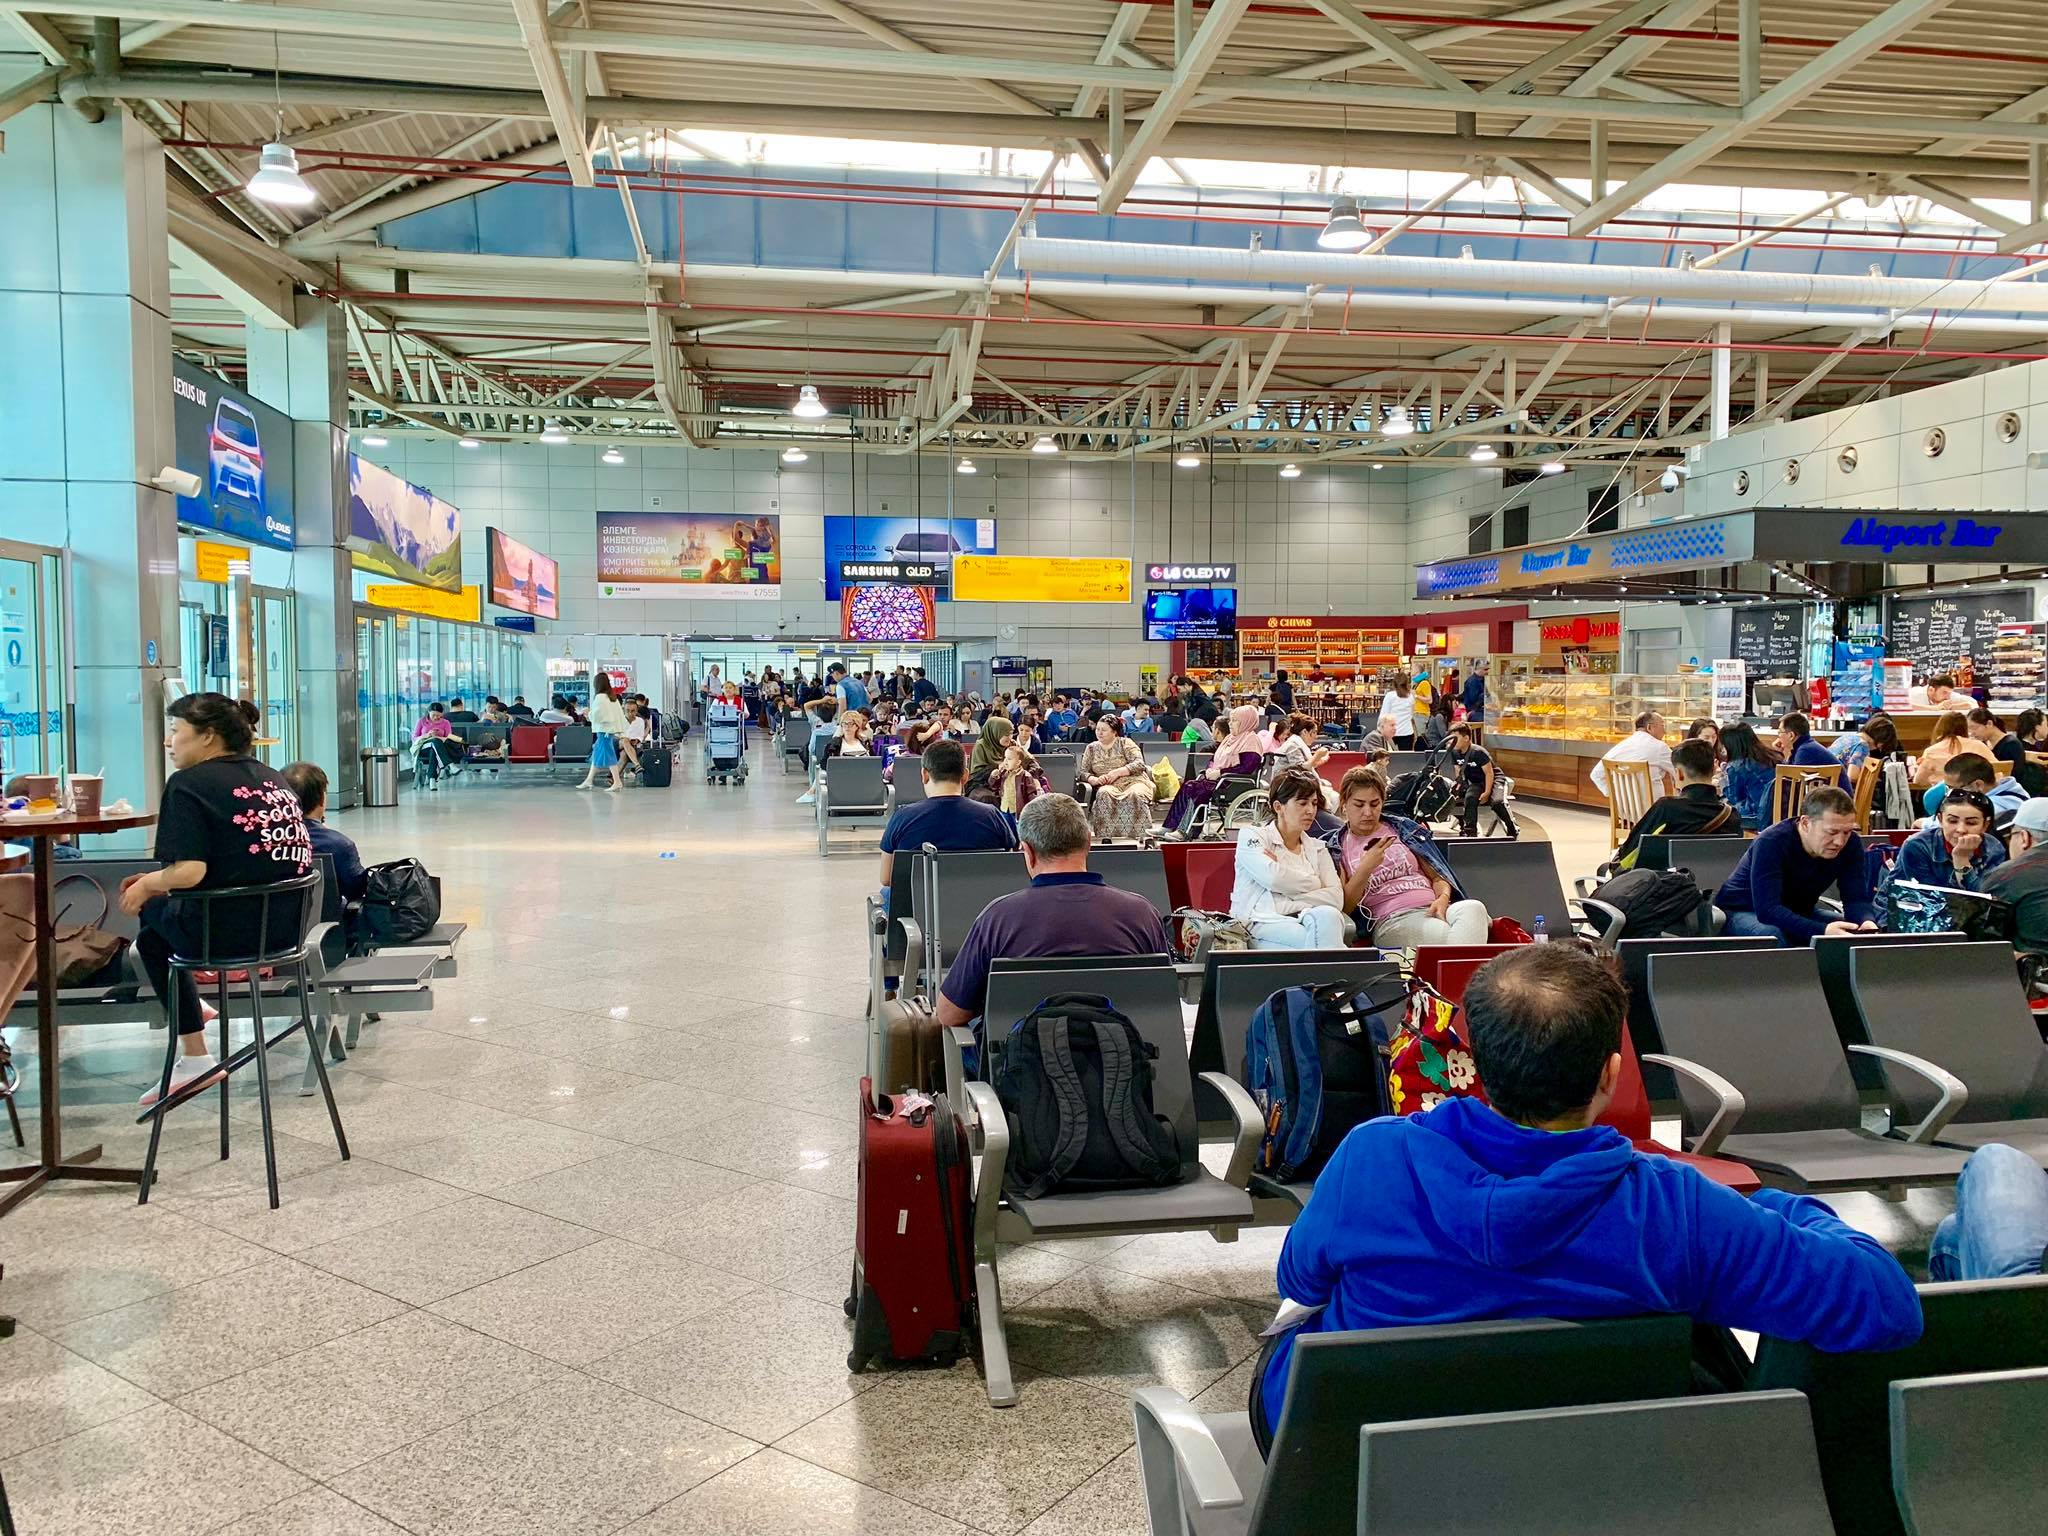 Kach Solo Travels in 2019 I just arrived in Dushanbe, Tajikistan6.jpg